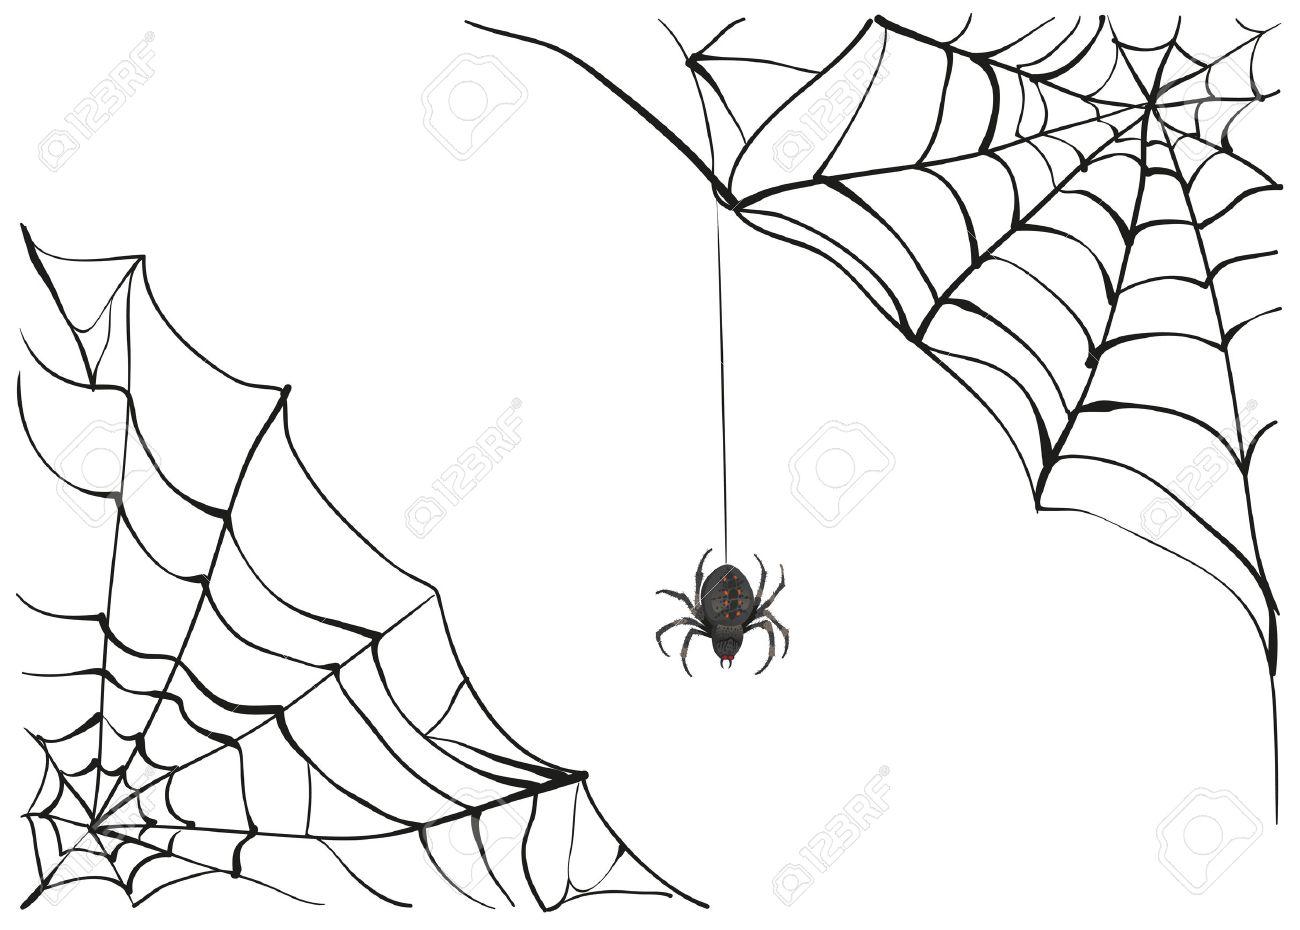 1300x930 Spiderweb. Big Black Spider Web. Black Scary Spider Of Web. Poison